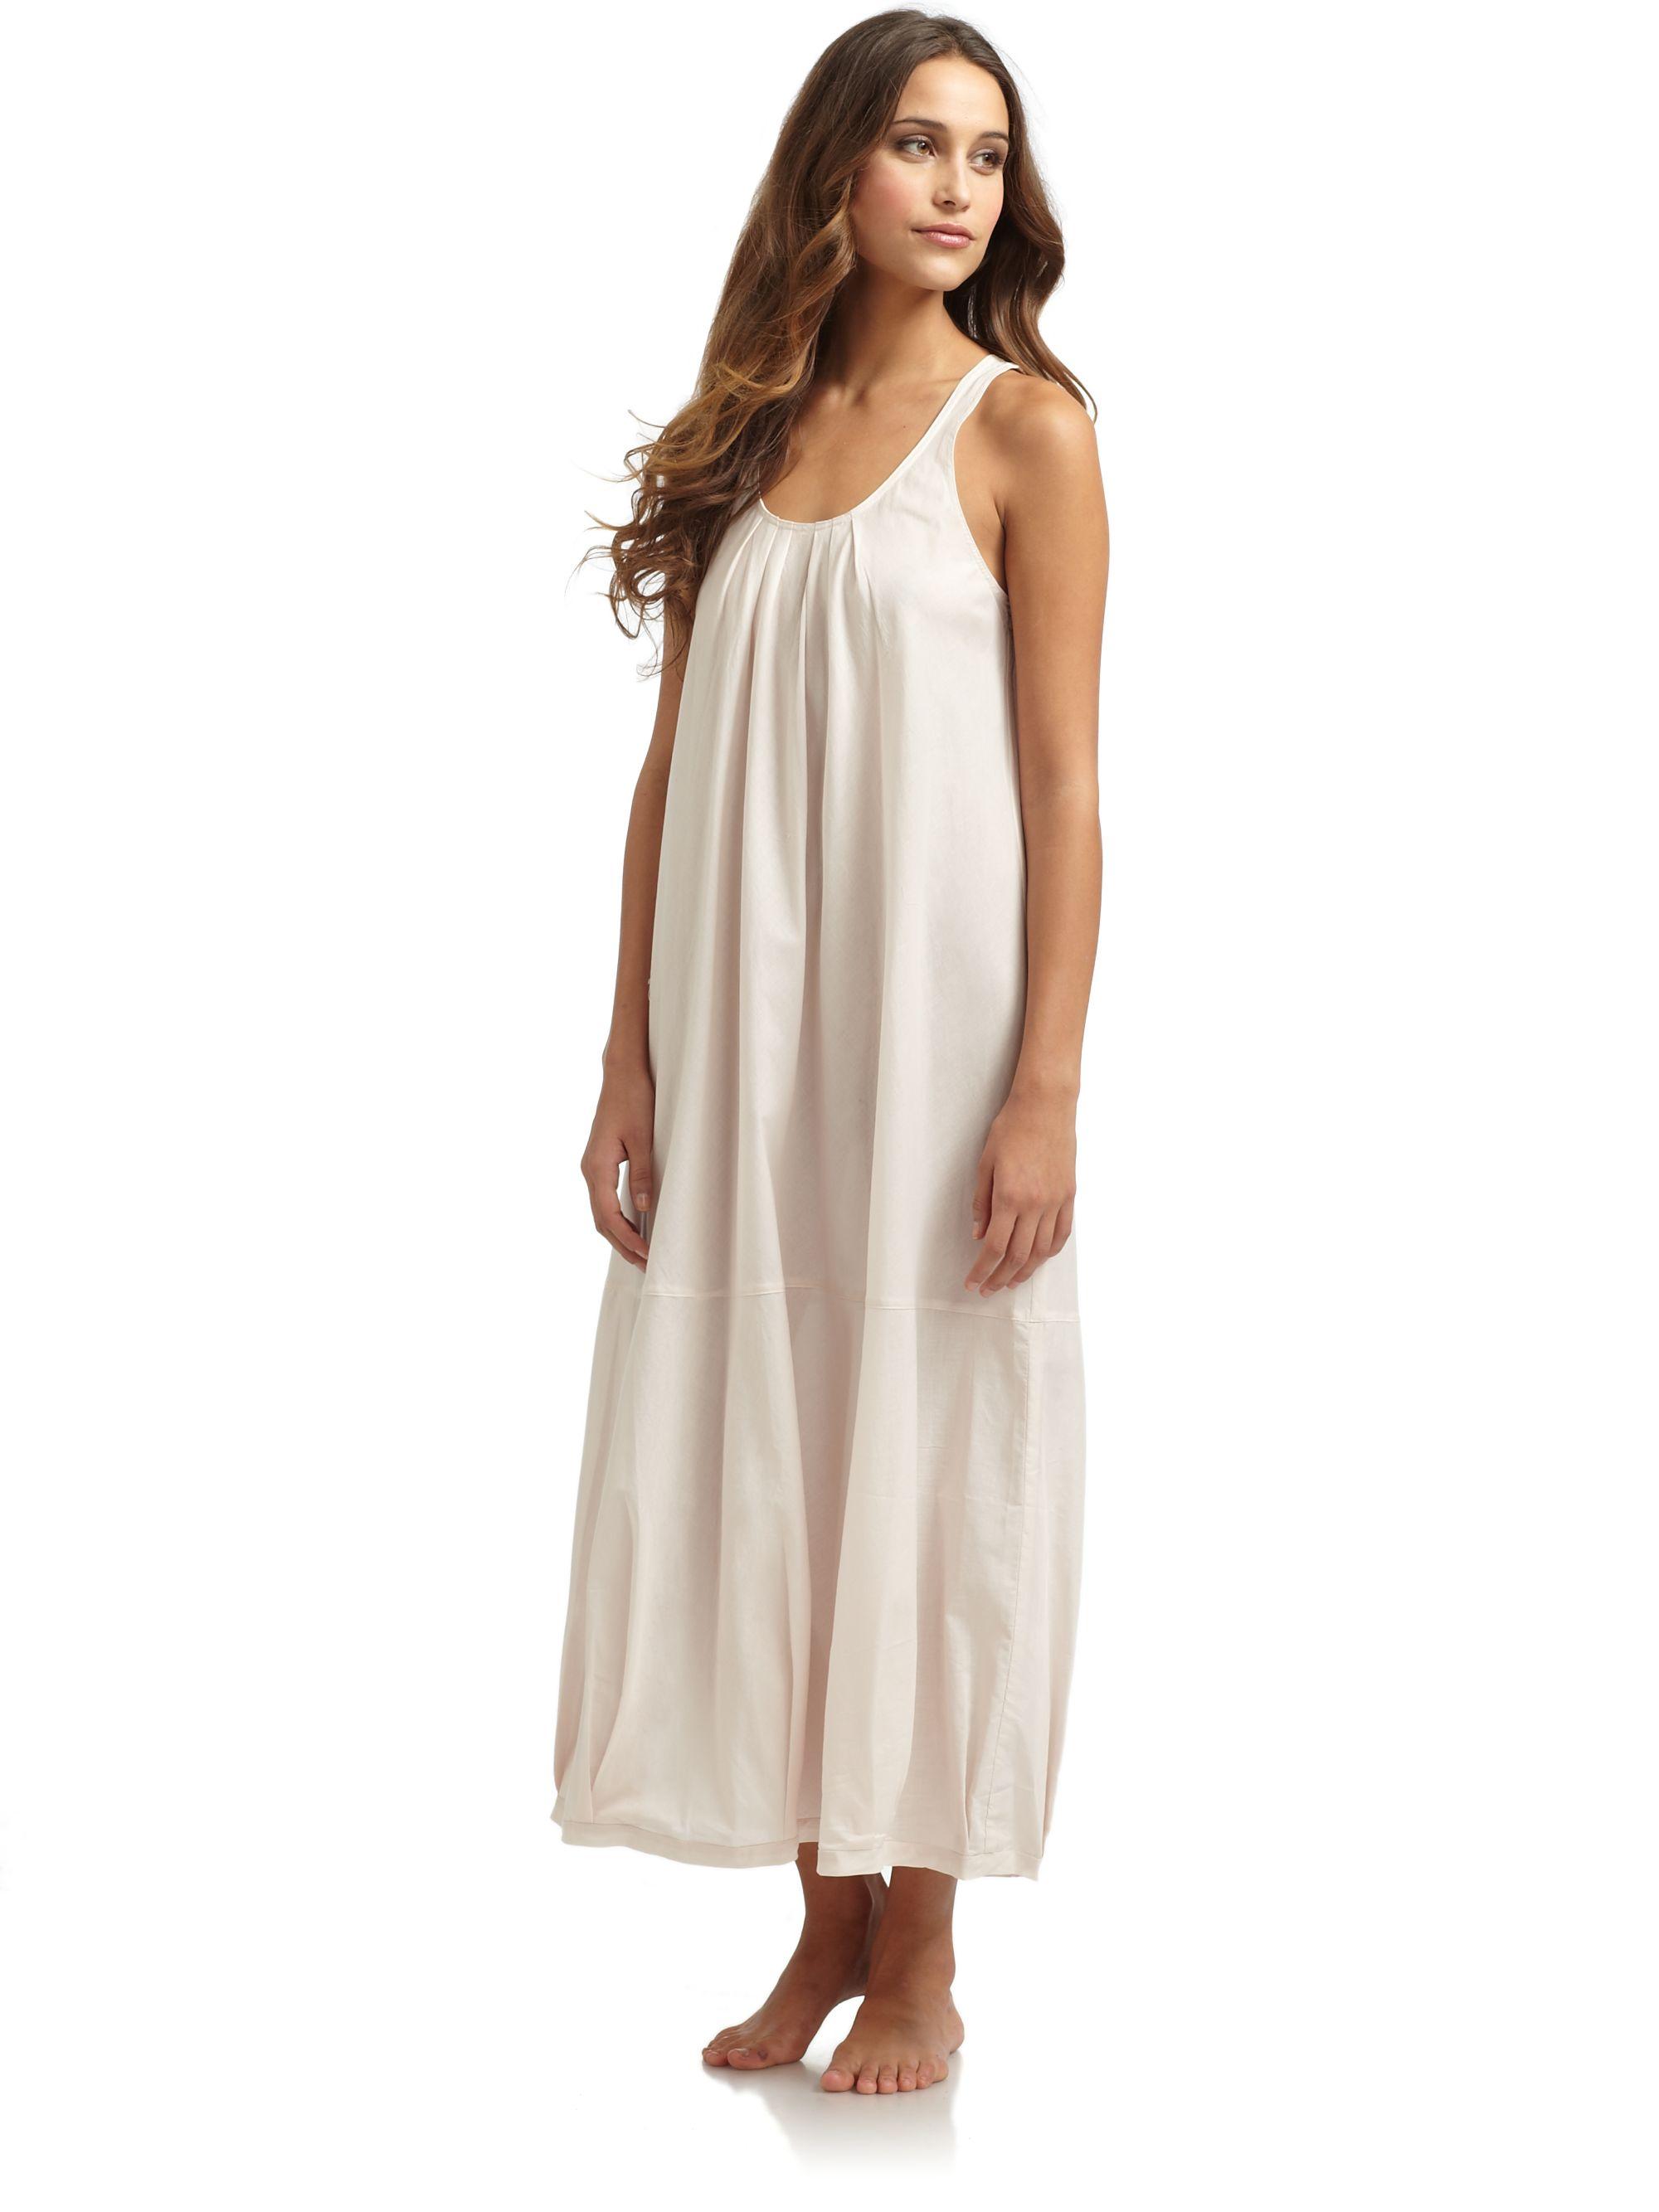 donna karan new york cotton batist long sleeveless nightgown in pink